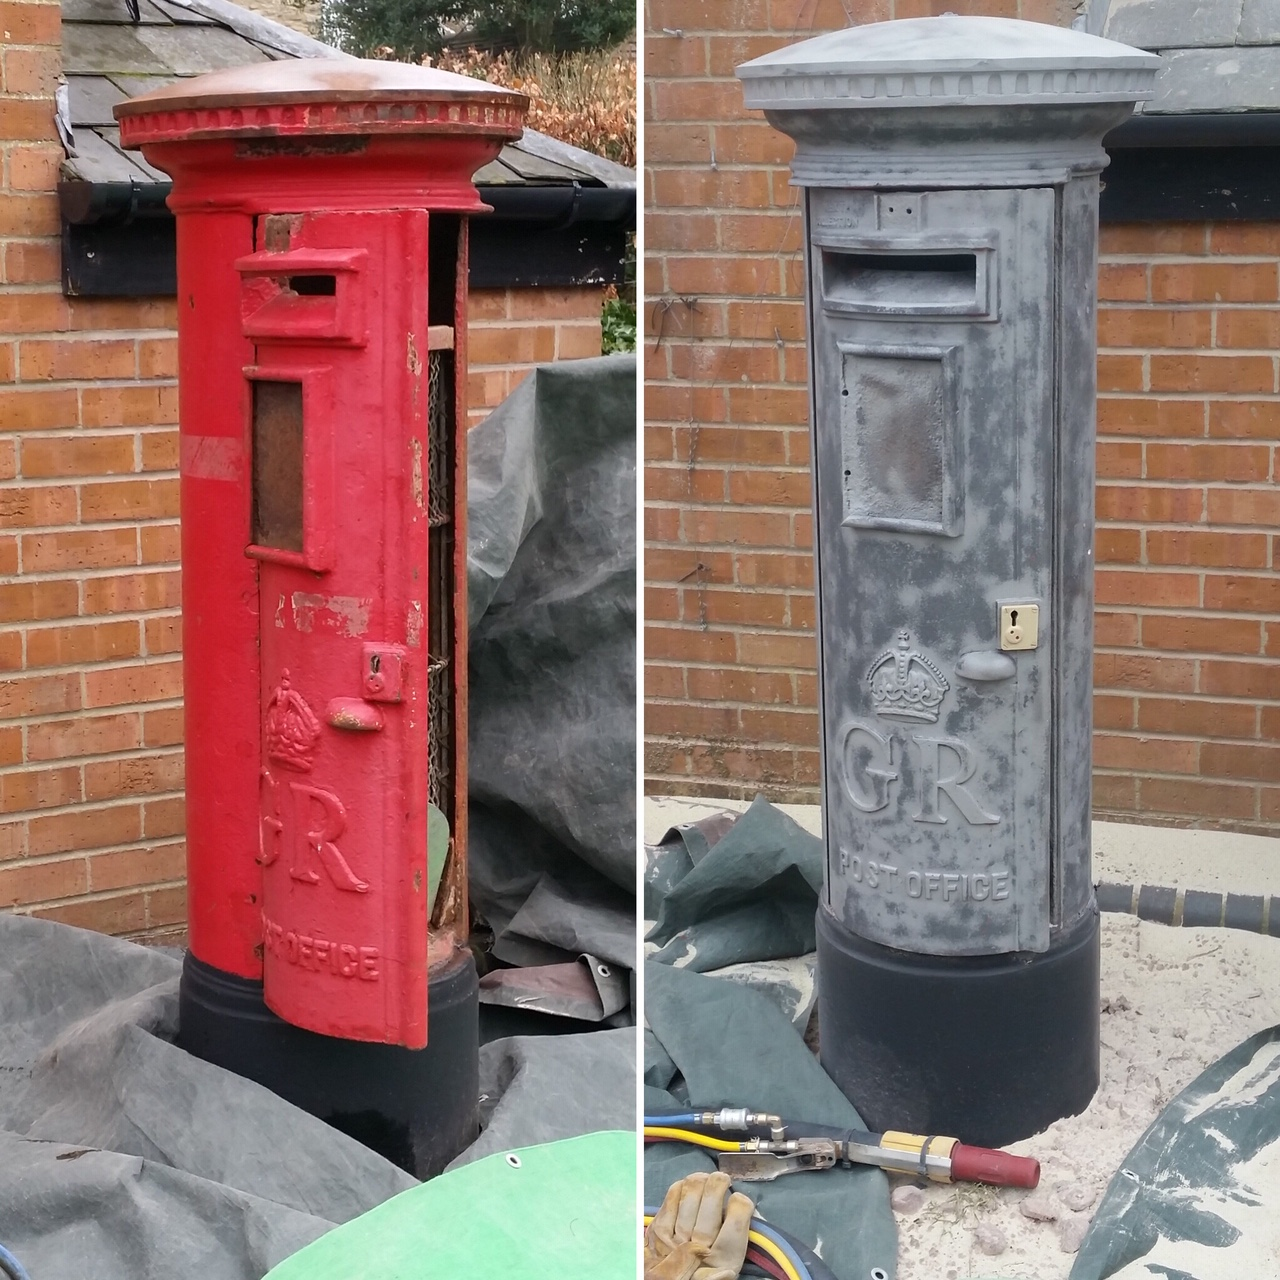 Sandblasting an old Royal Mail letter bo